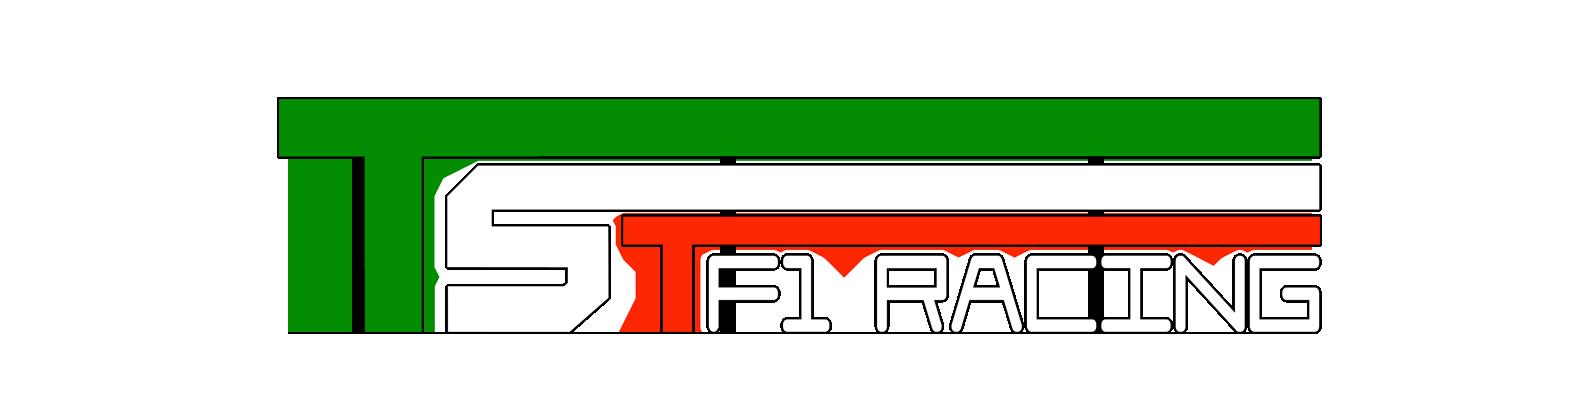 TSTF1Racing